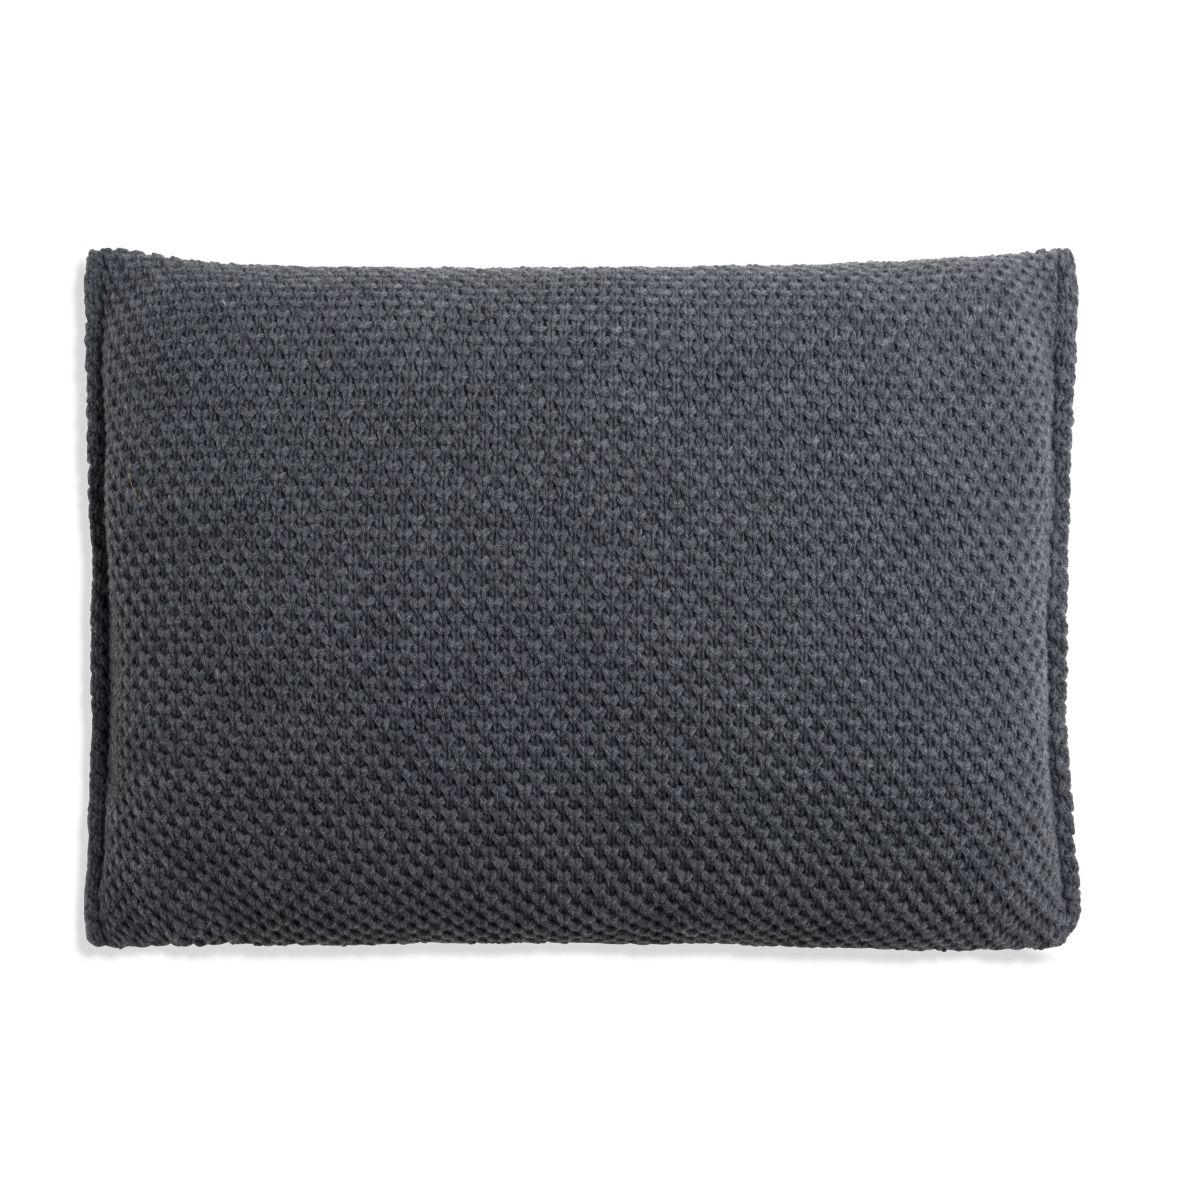 knit factory 1181310 kussen 60x40 lynn antraciet 2